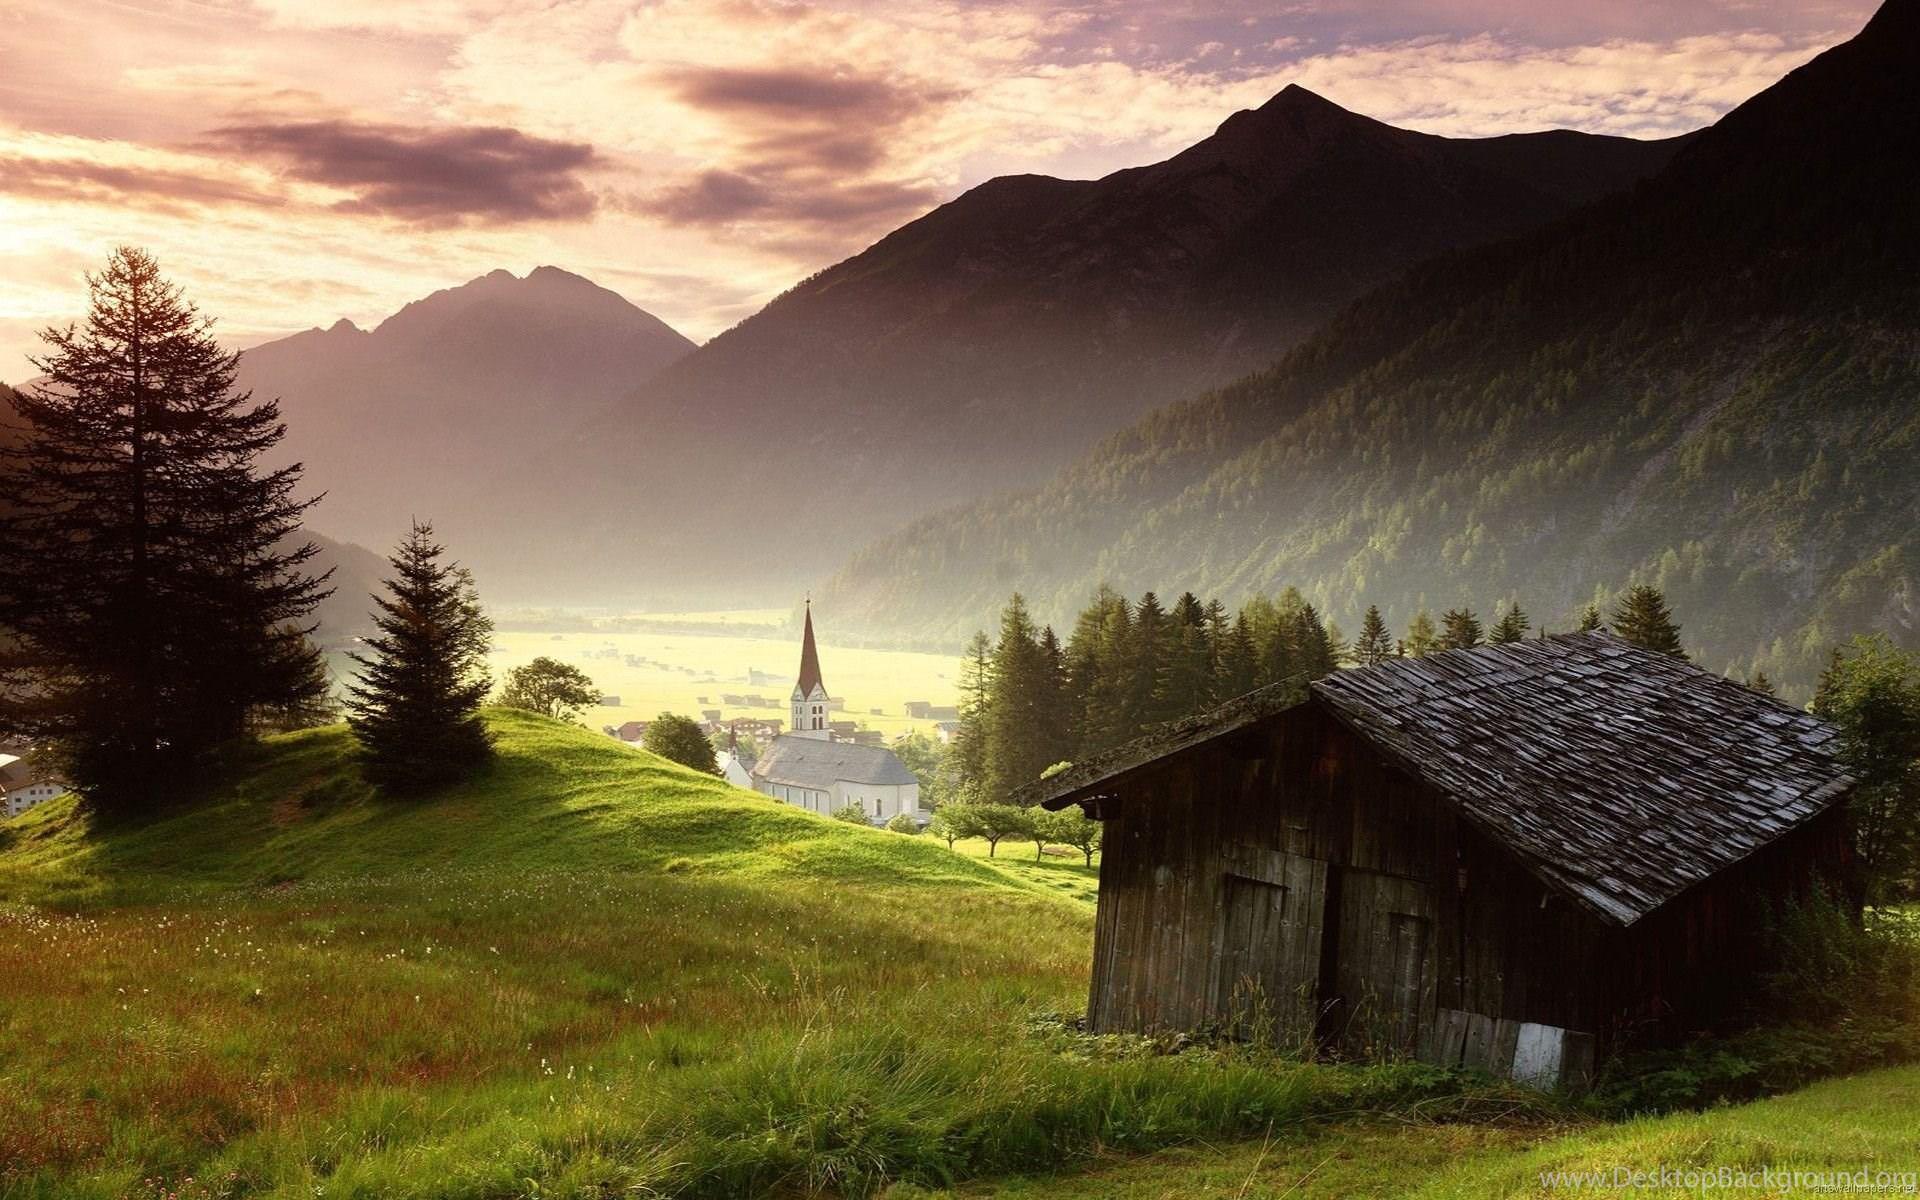 Nature Hd Wallpapers Widescreen Full Hd 1080p Nature Hd Desktop Background